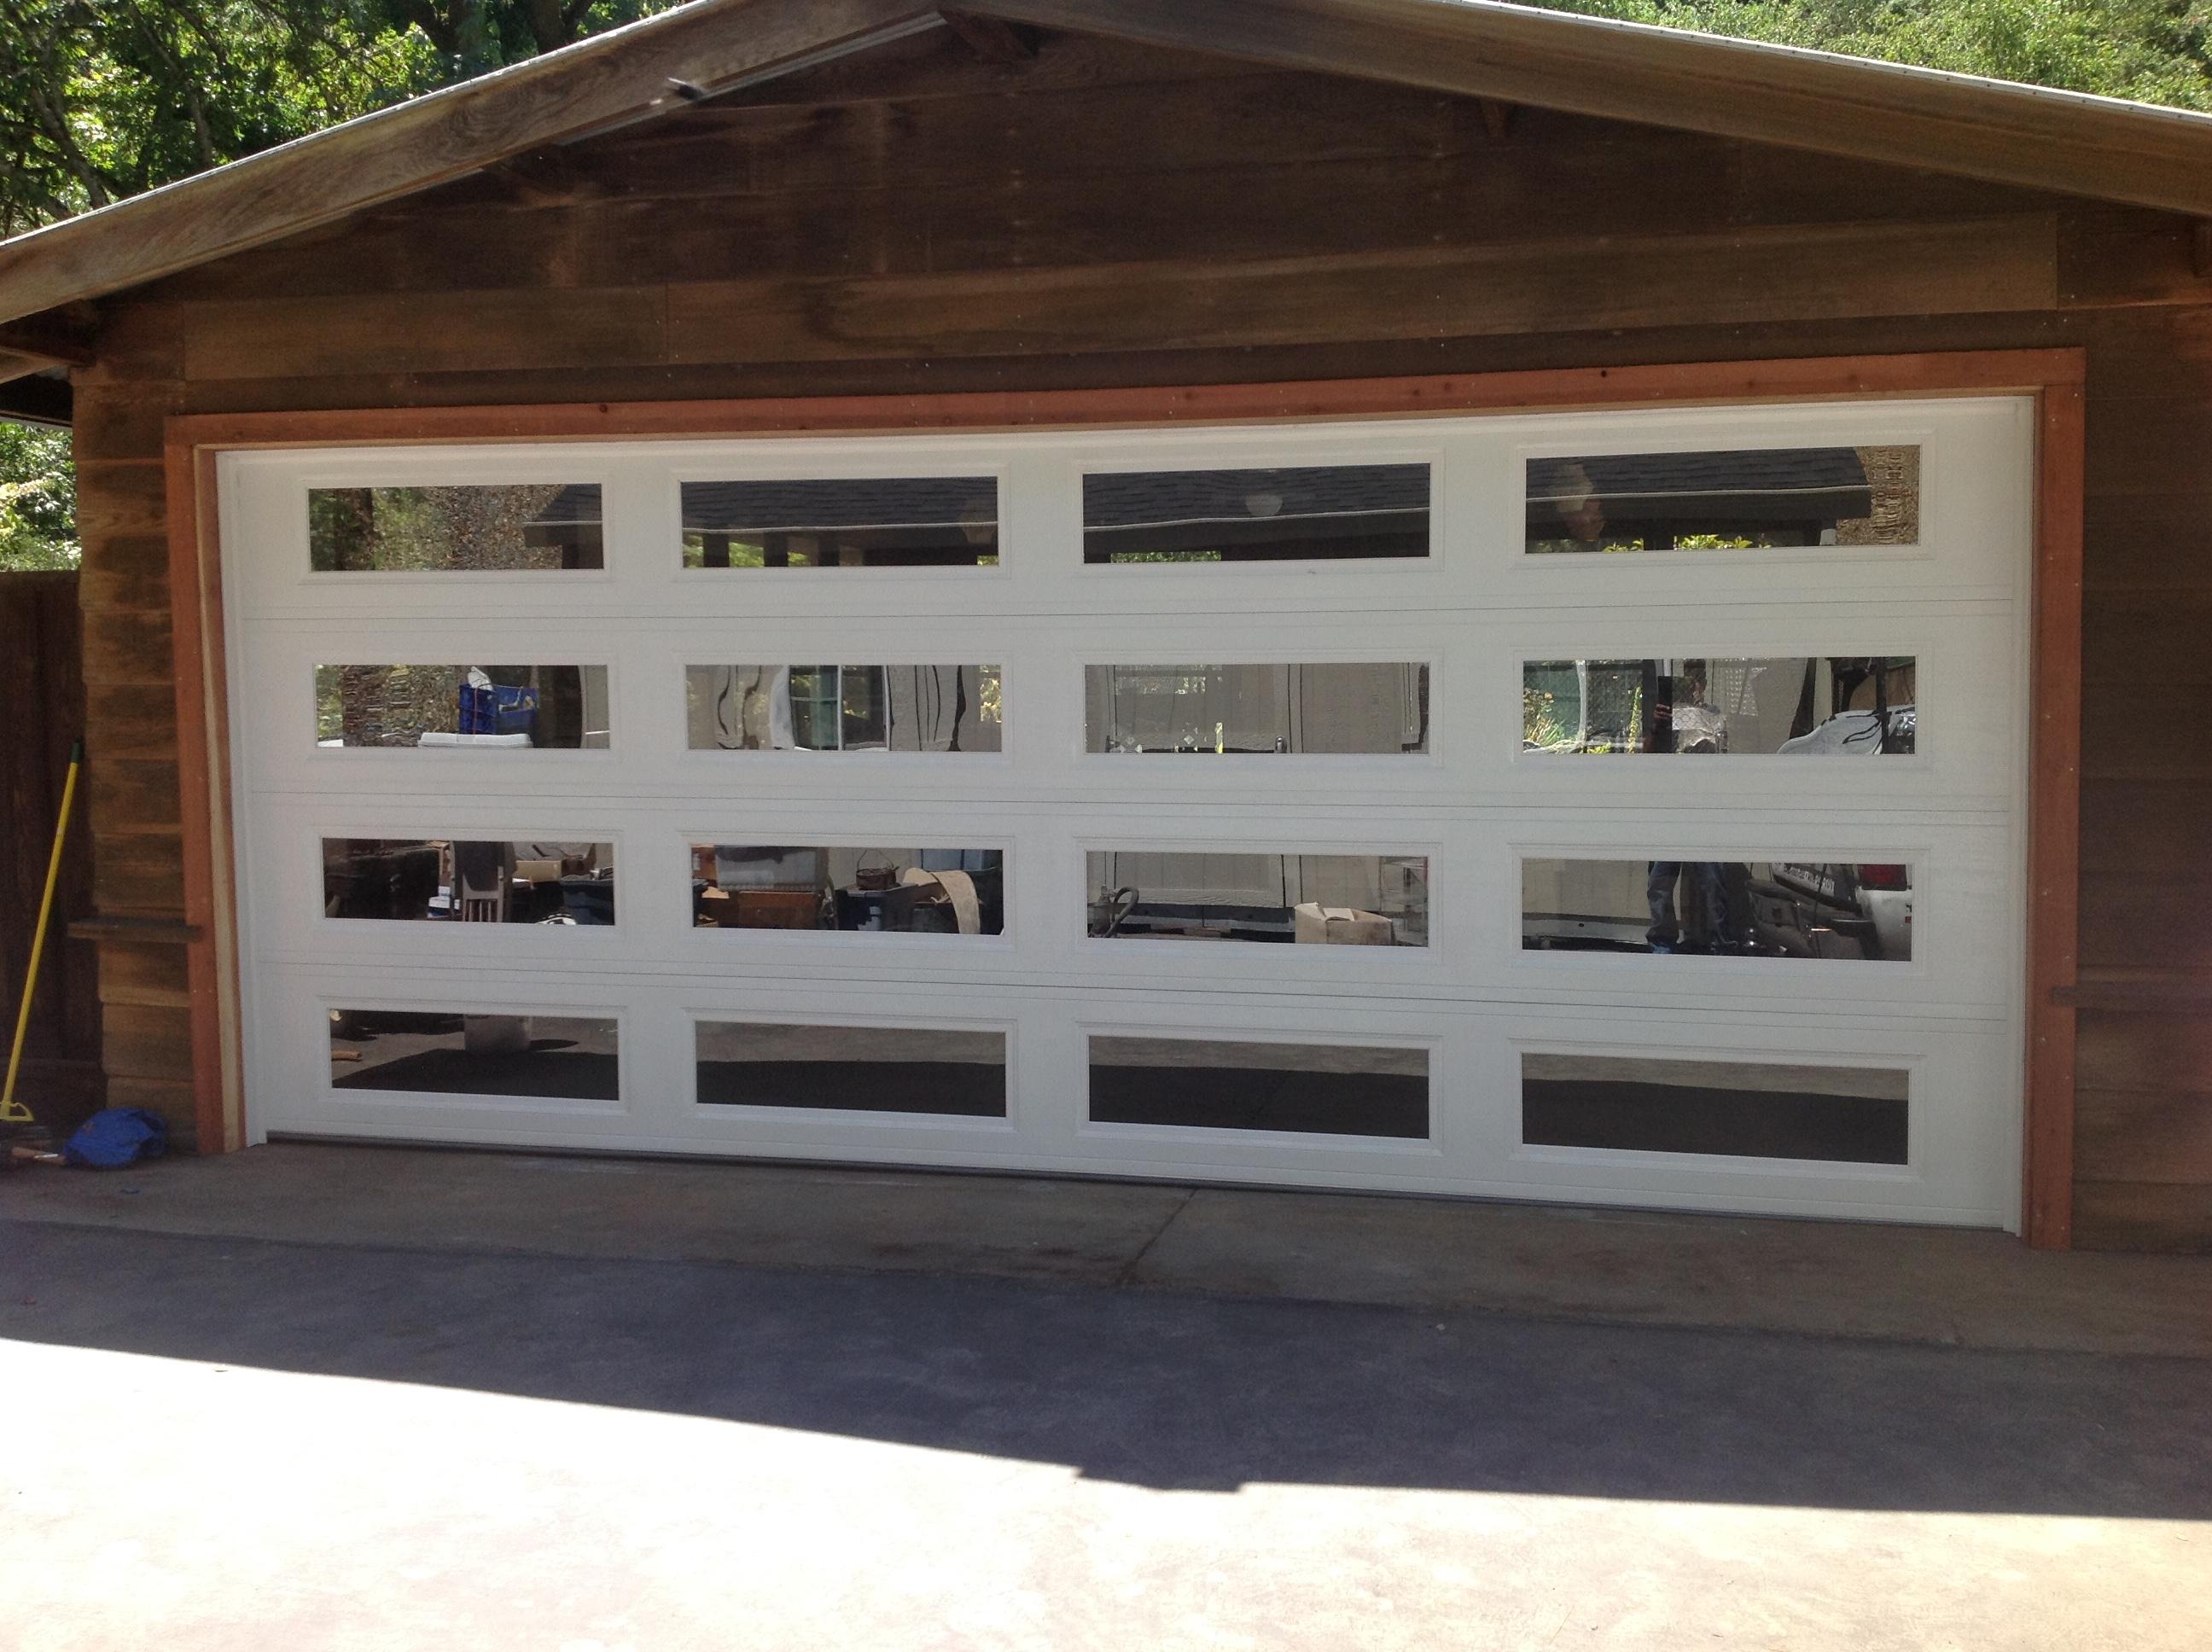 JC Garage Door Center 405 Railroad Ave Ste D, Suisun City, CA 94585   YP.com